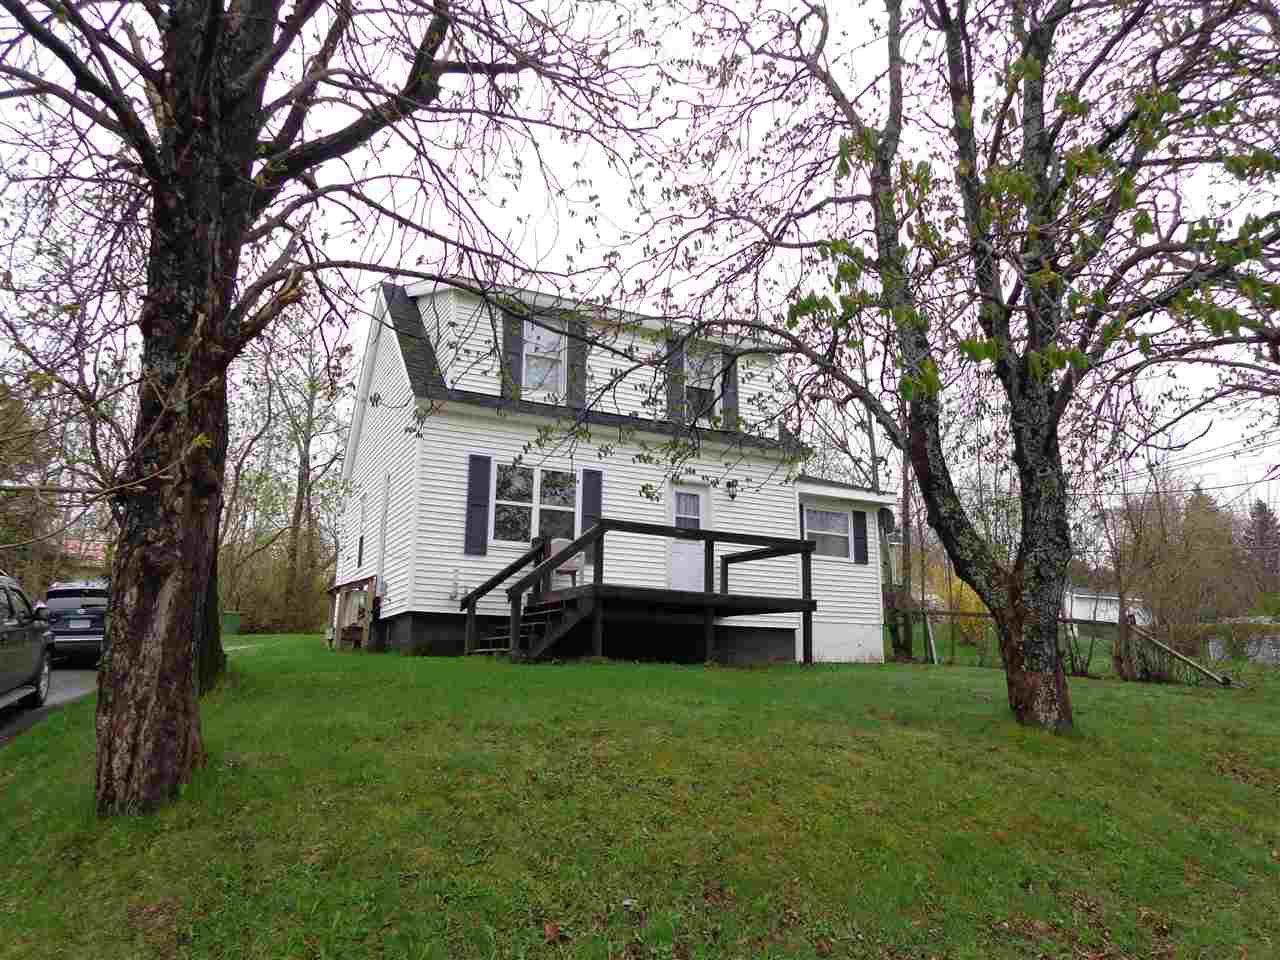 Main Photo: 30 Seventh Street in Trenton: 107-Trenton,Westville,Pictou Residential for sale (Northern Region)  : MLS®# 202002722